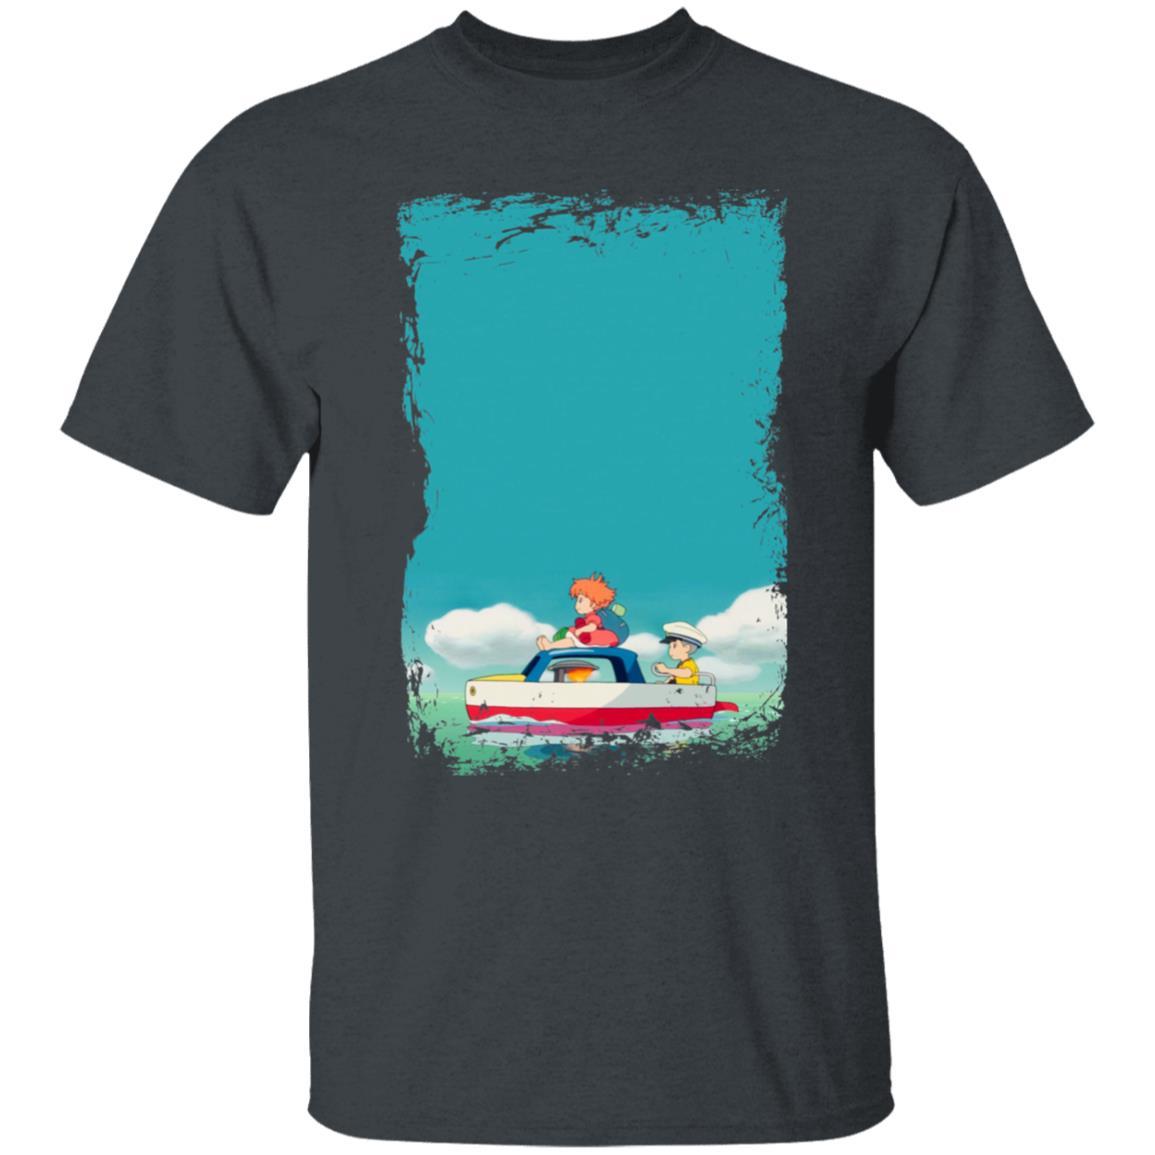 Ponyo and Sosuke on Boat T Shirt